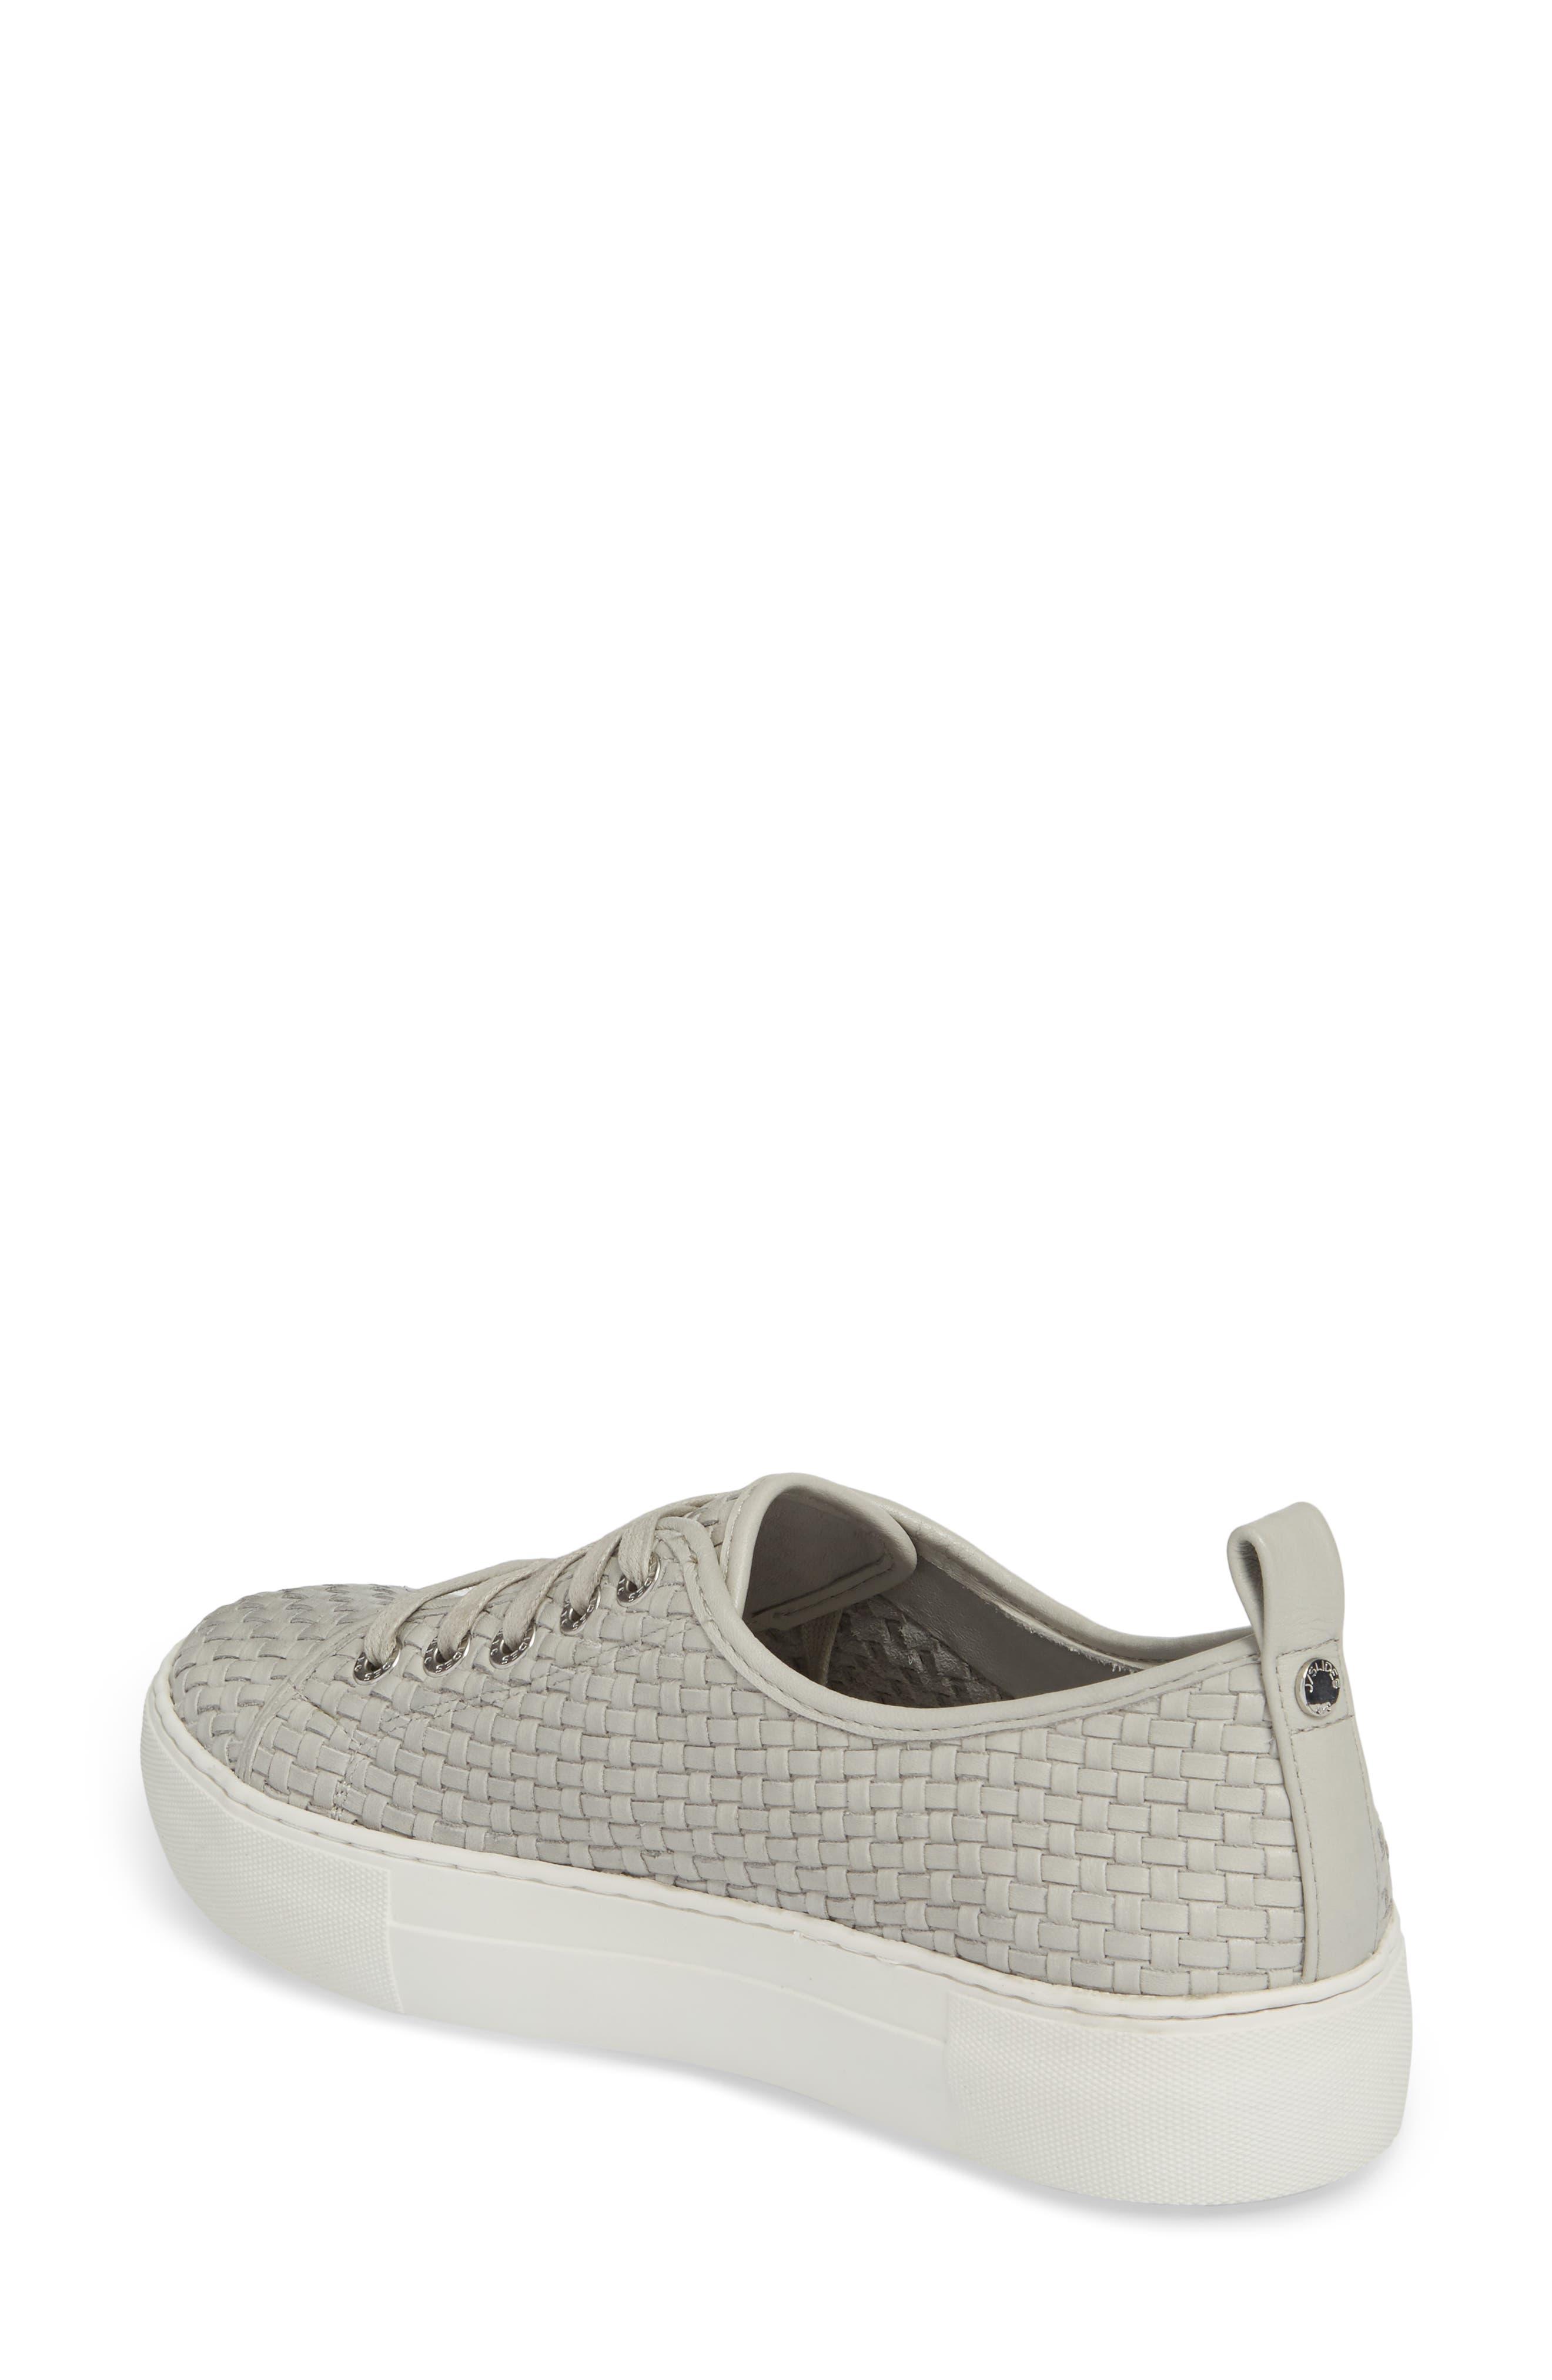 Artsy Woven Platform Sneaker,                             Alternate thumbnail 2, color,                             Pale Grey Leather